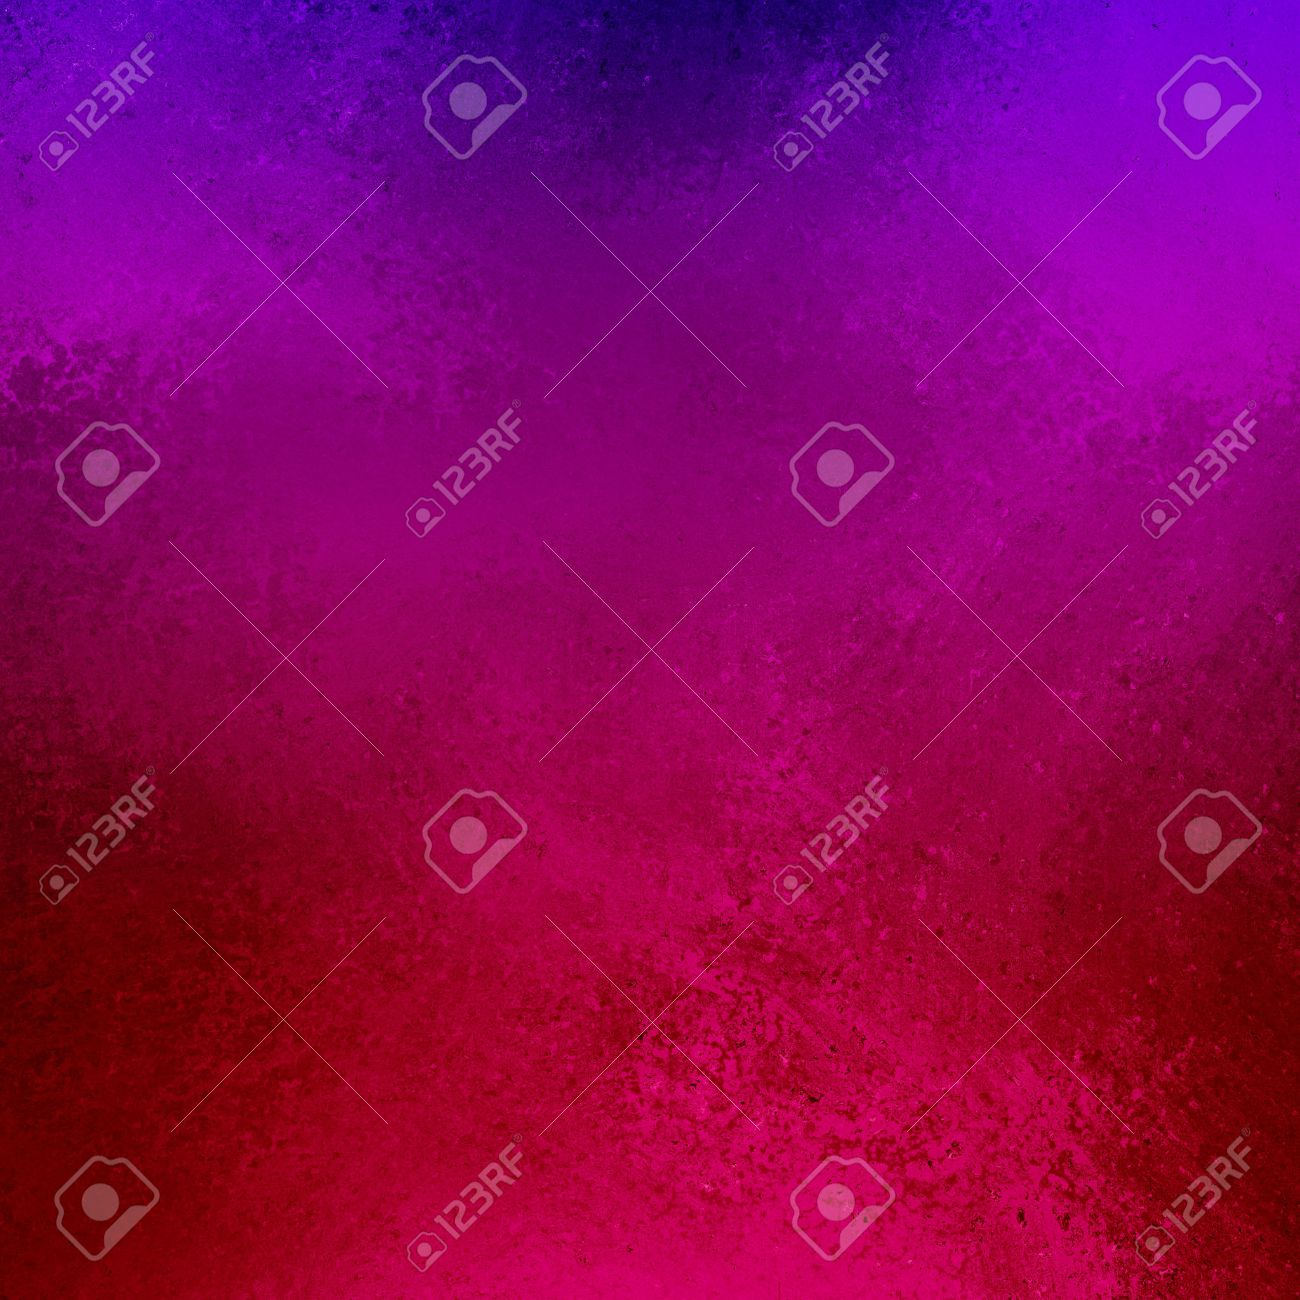 abstract purple background blue pink gradient color frame soft blur vintage grunge background texture design